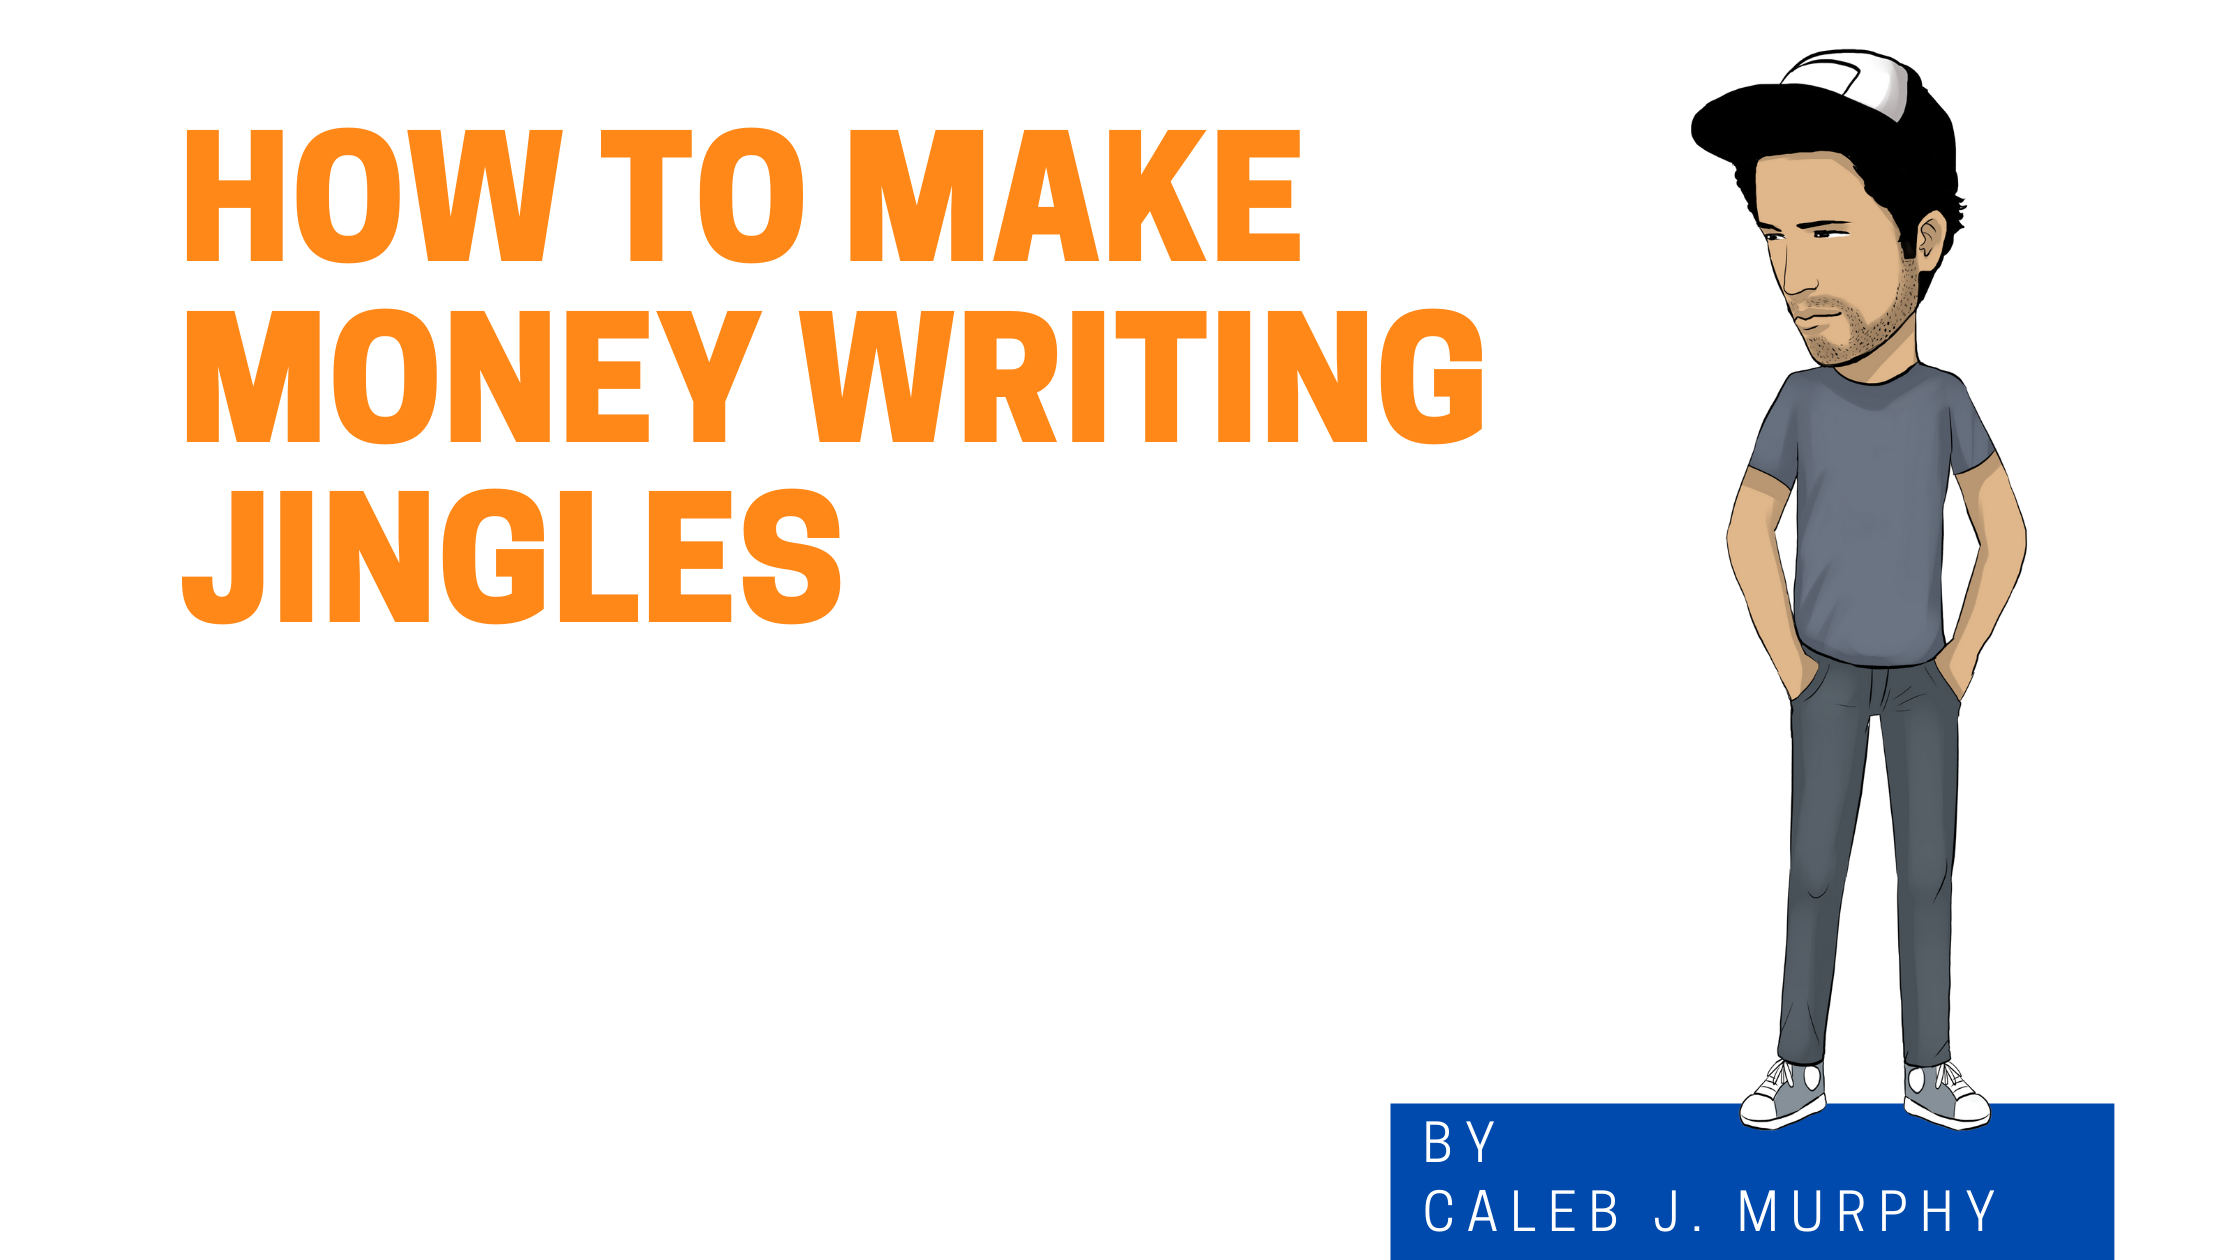 How To Make Money Writing Jingles graphic with cartoon avatar of Caleb